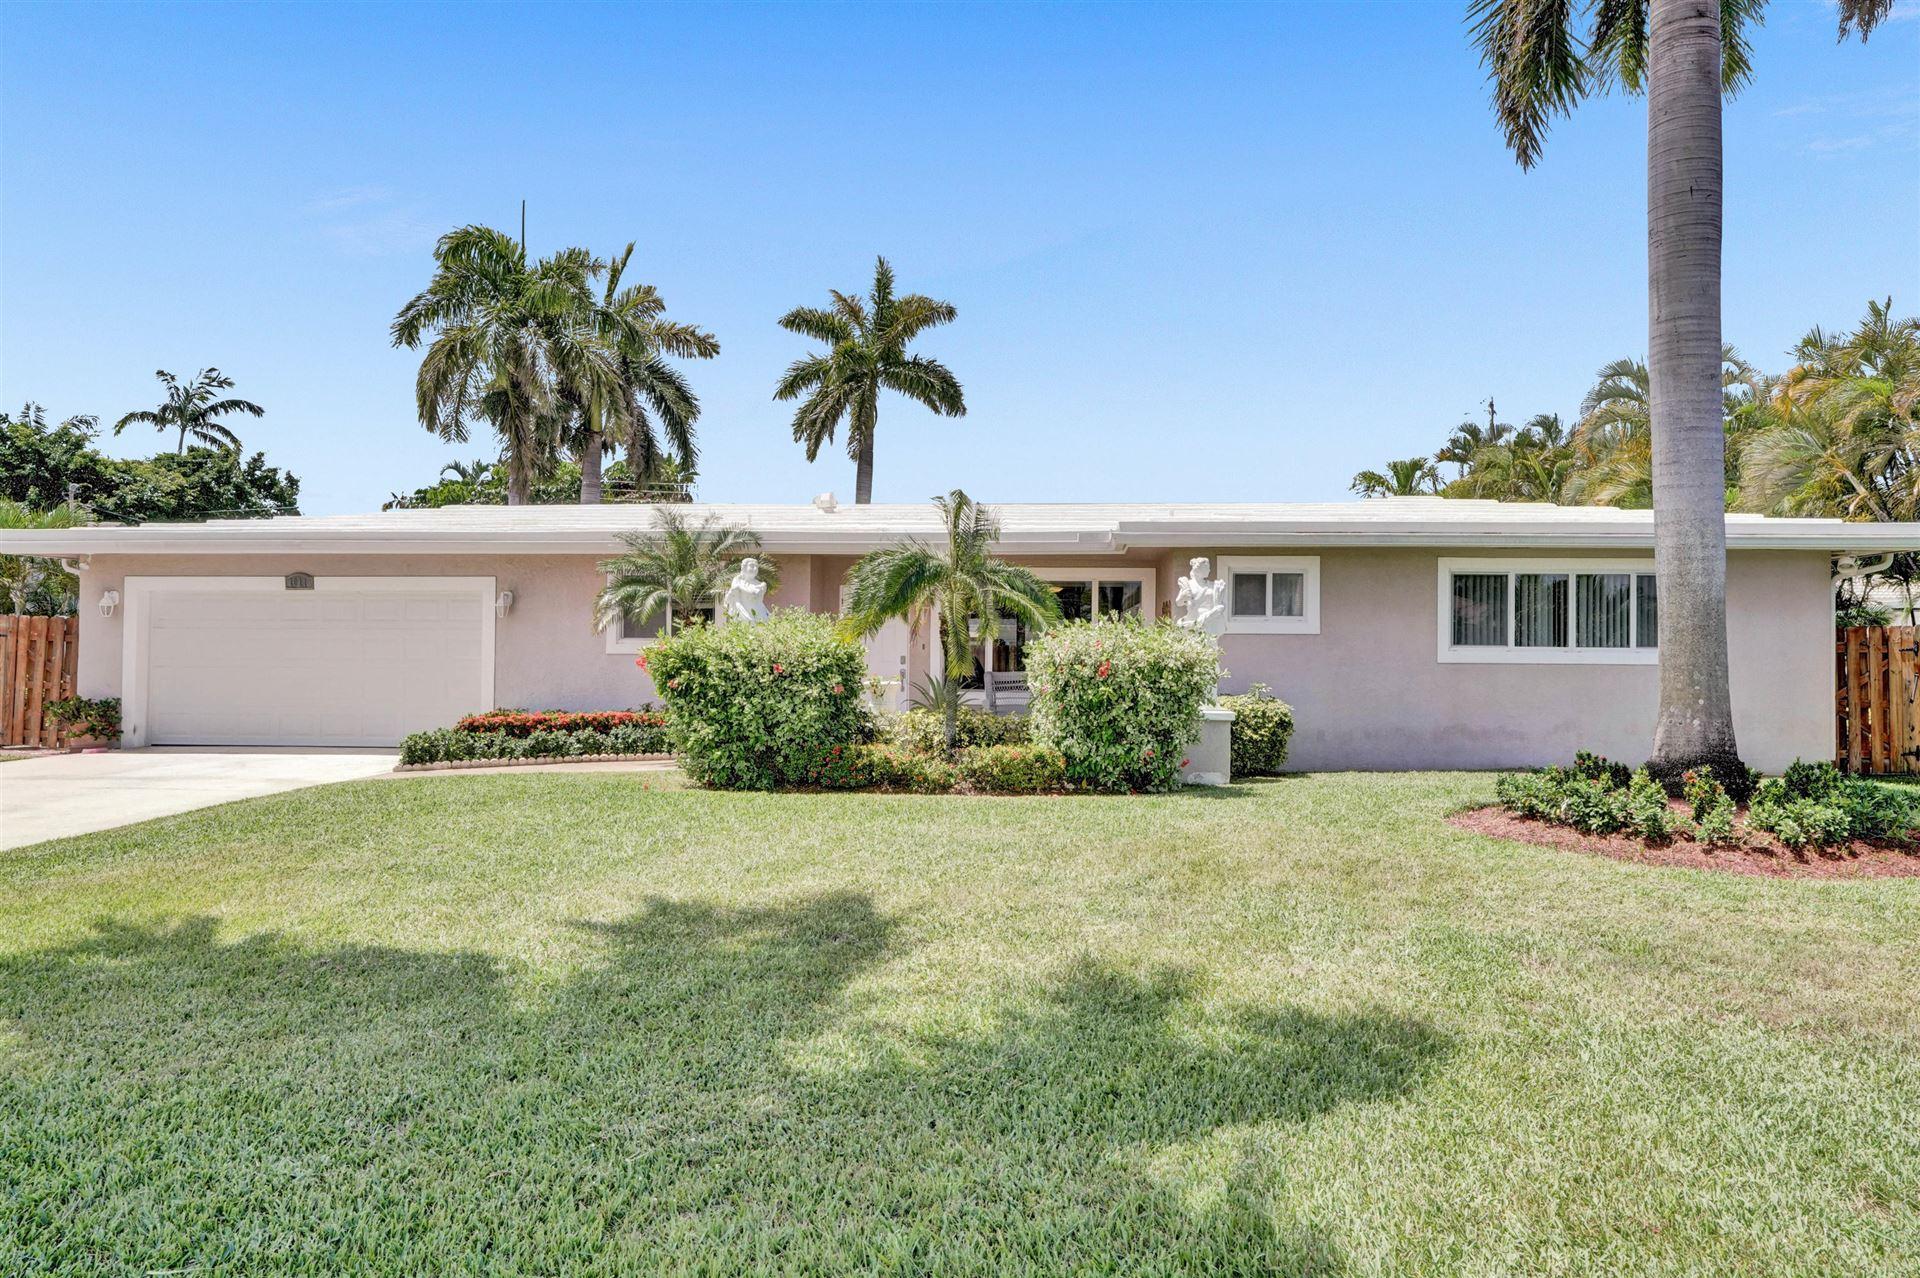 1011 SE 10th Court, Deerfield Beach, FL 33441 - MLS#: RX-10737556